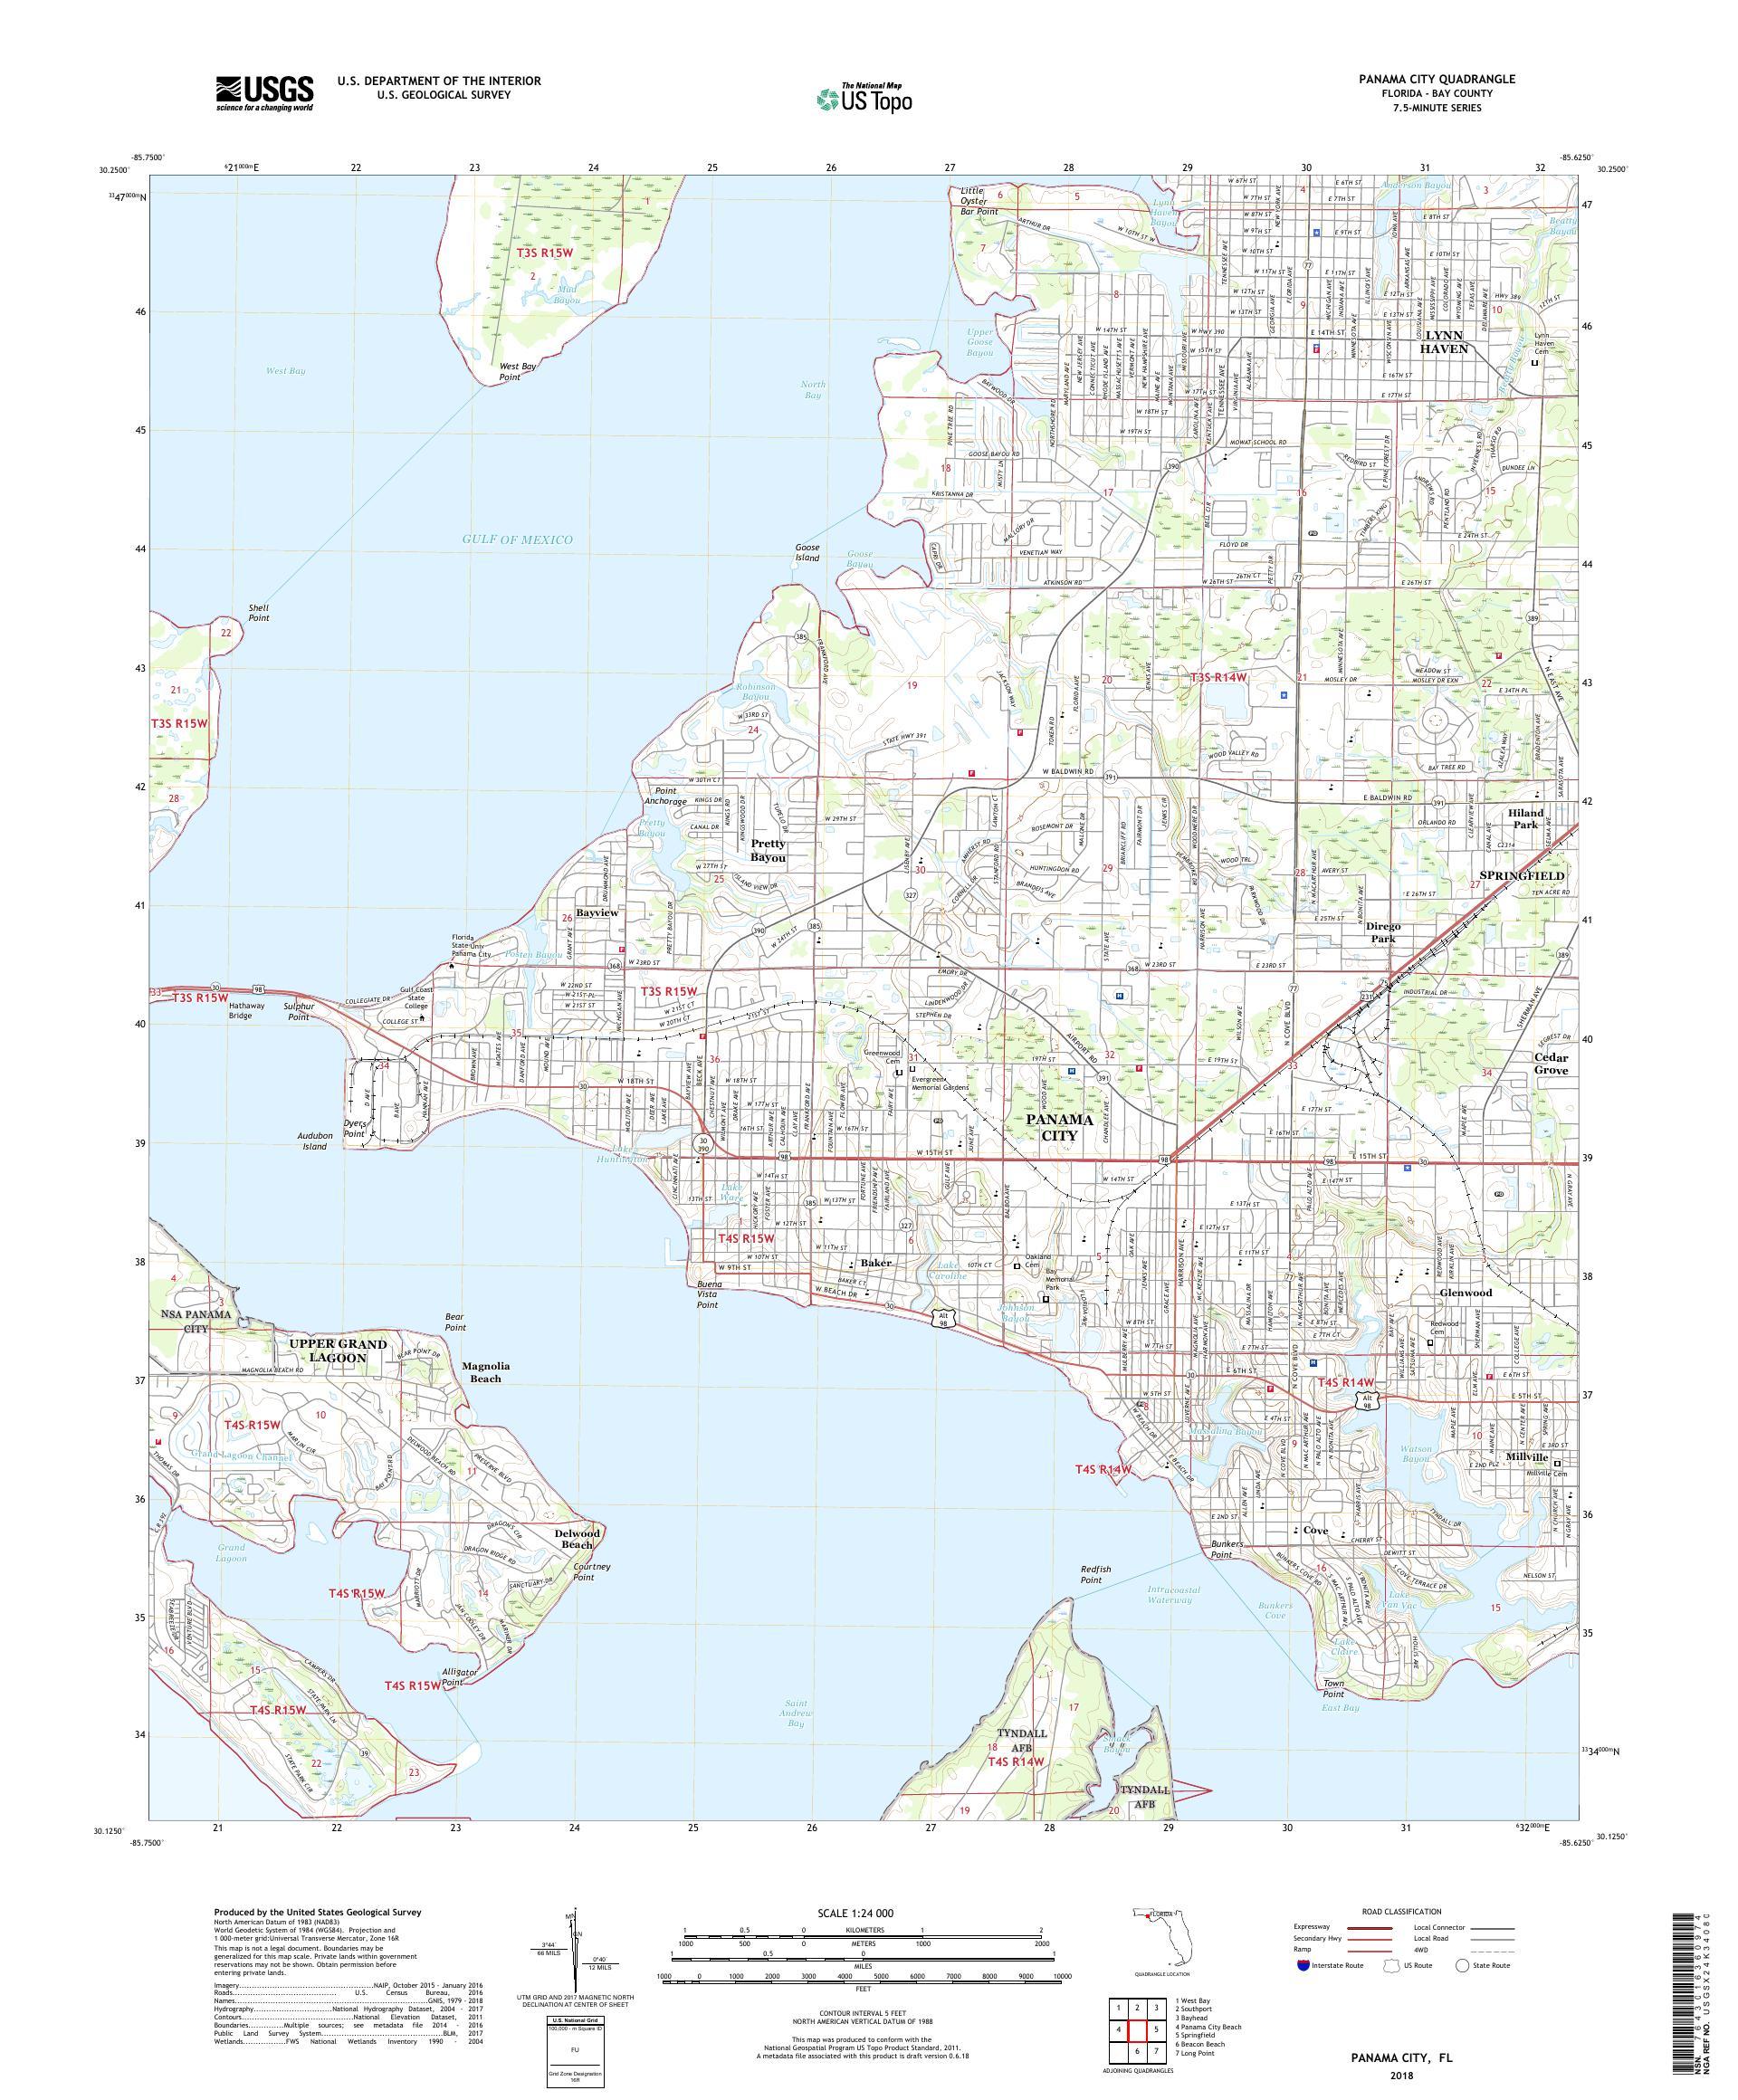 Panama City Map Of Florida.Mytopo Panama City Florida Usgs Quad Topo Map